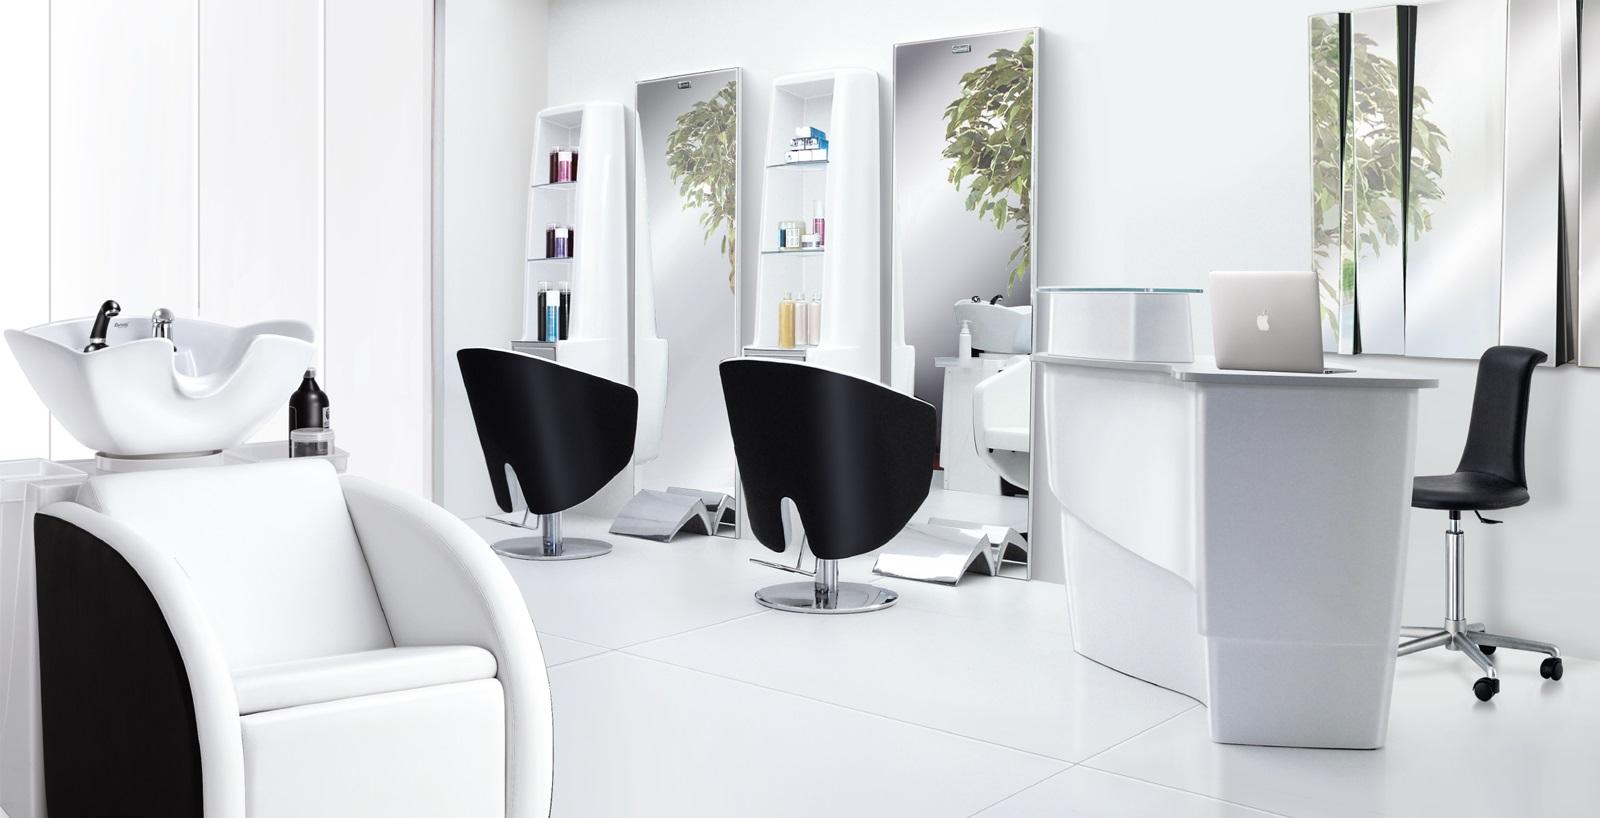 ambienti parruccherie ceriotti contract gambula